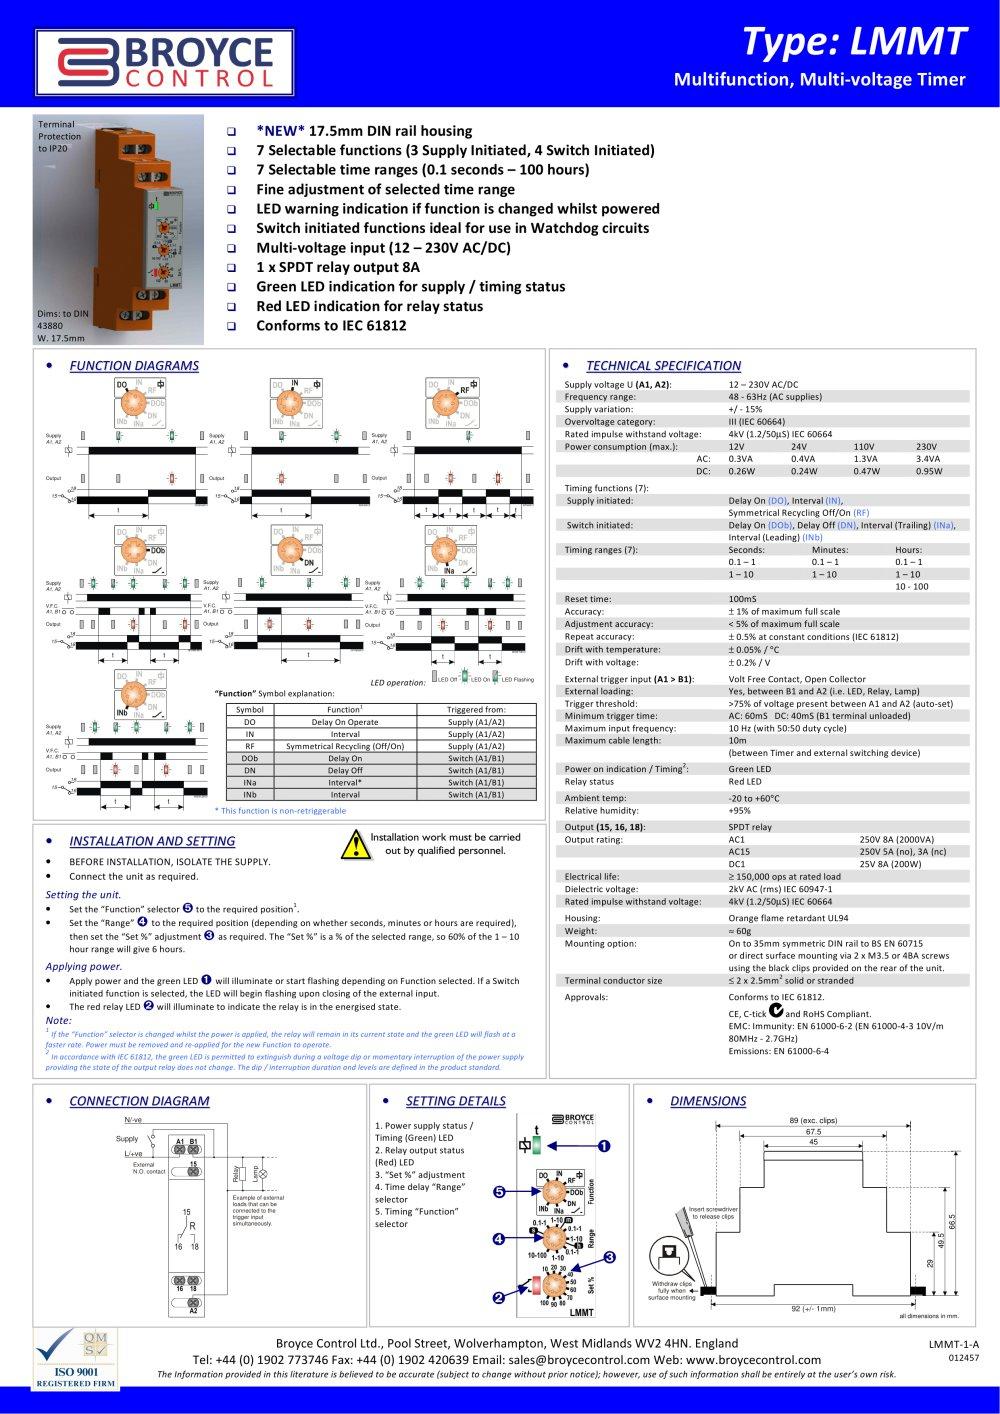 LMMT Broyce Control PDF Catalogue Technical Documentation